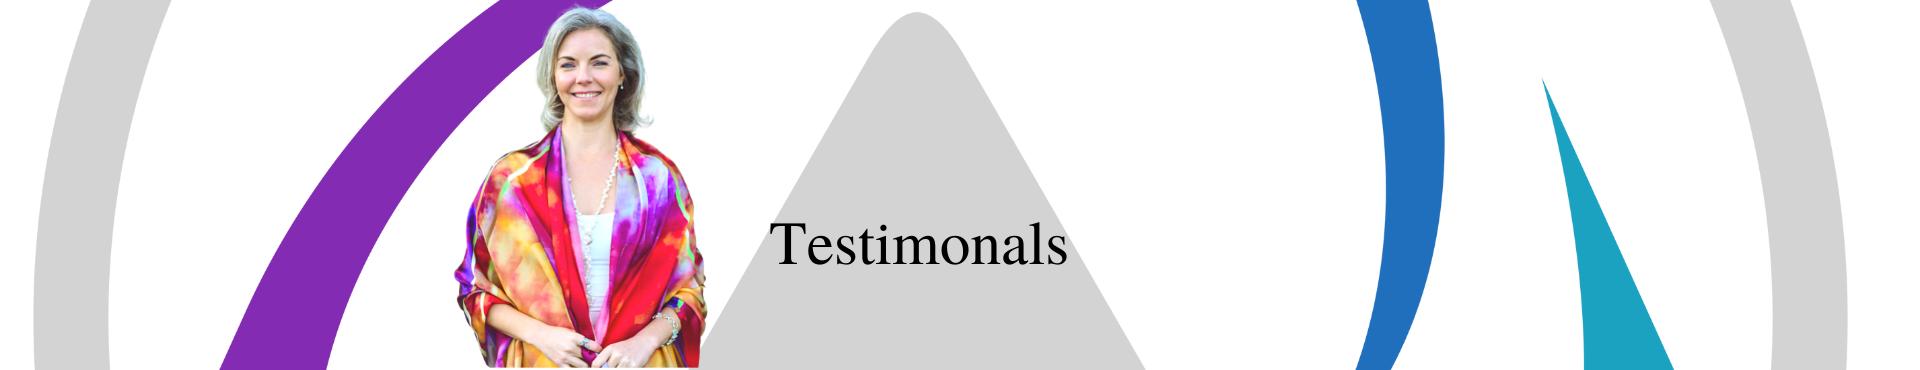 Testimonials Page, Header Image